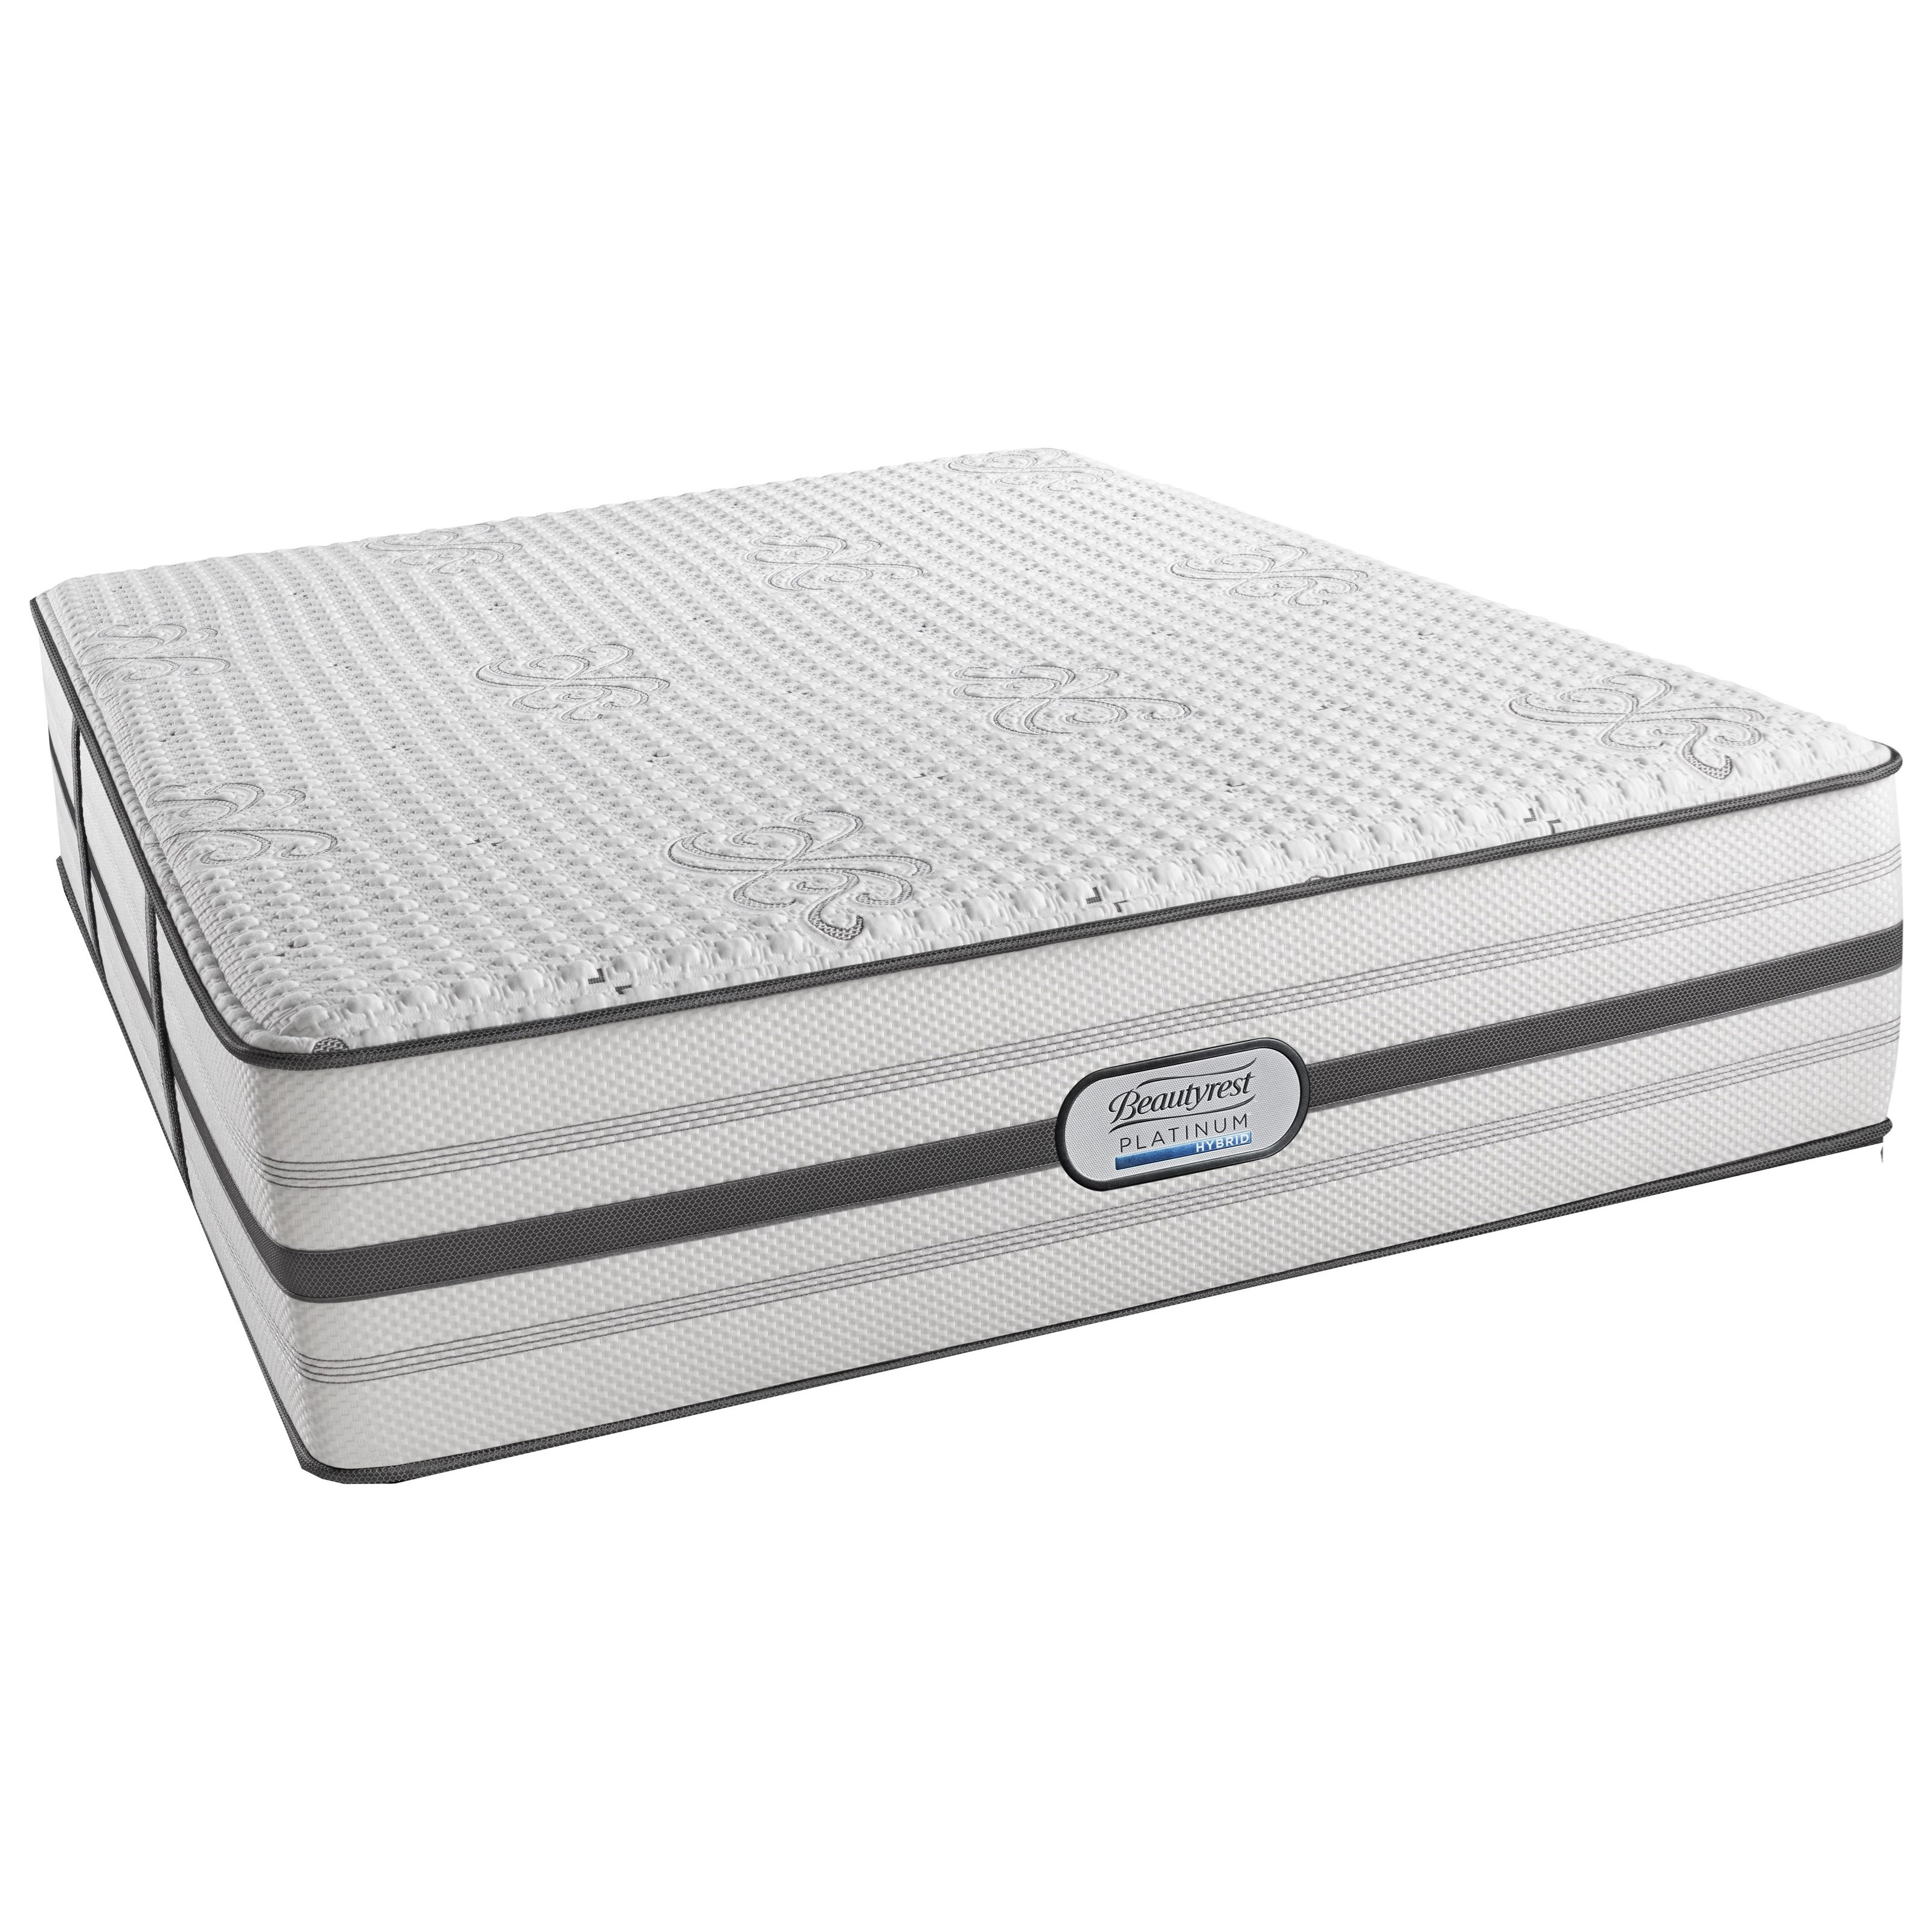 Beautyrest Platinum Hybrid Quinn Twin XL Ultra Plush Adjustable Set - Item Number: BRHLV4UPL-TXL+SM1-TXL